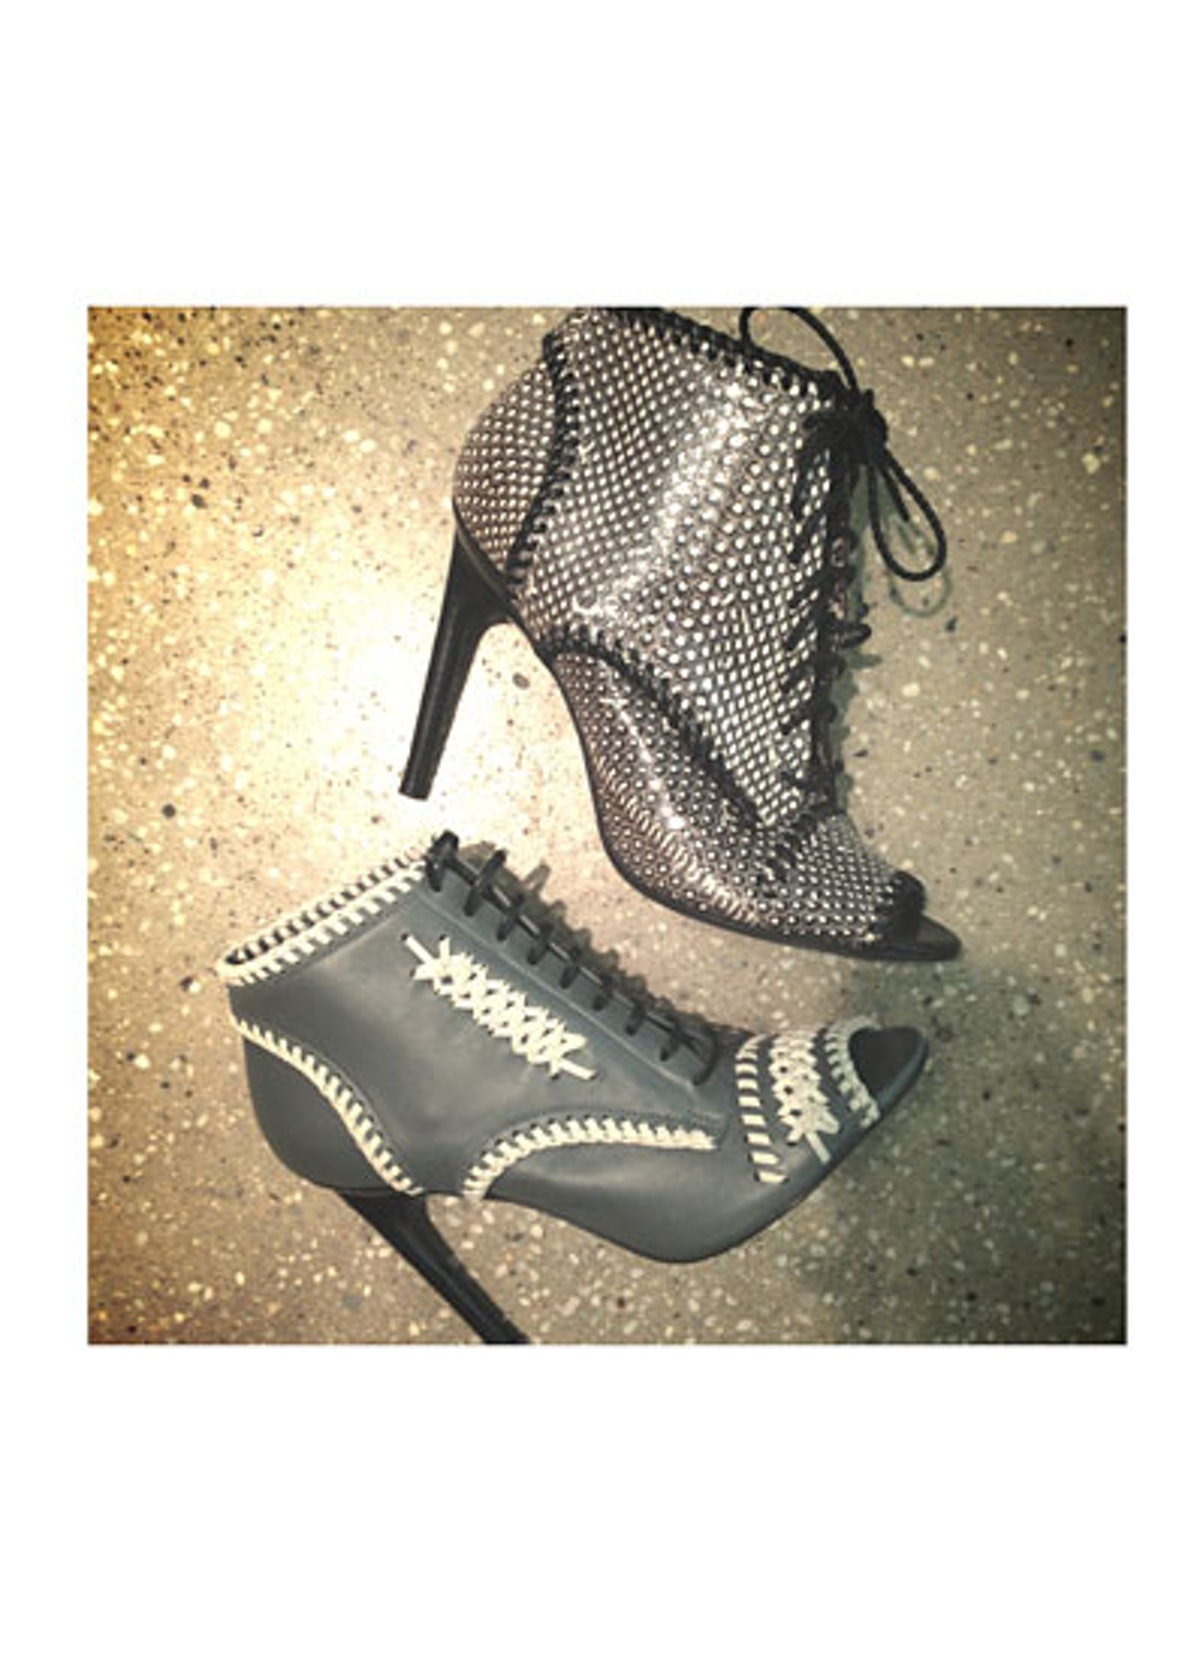 acss-best-shoes-fall-2013-05-v.jpg